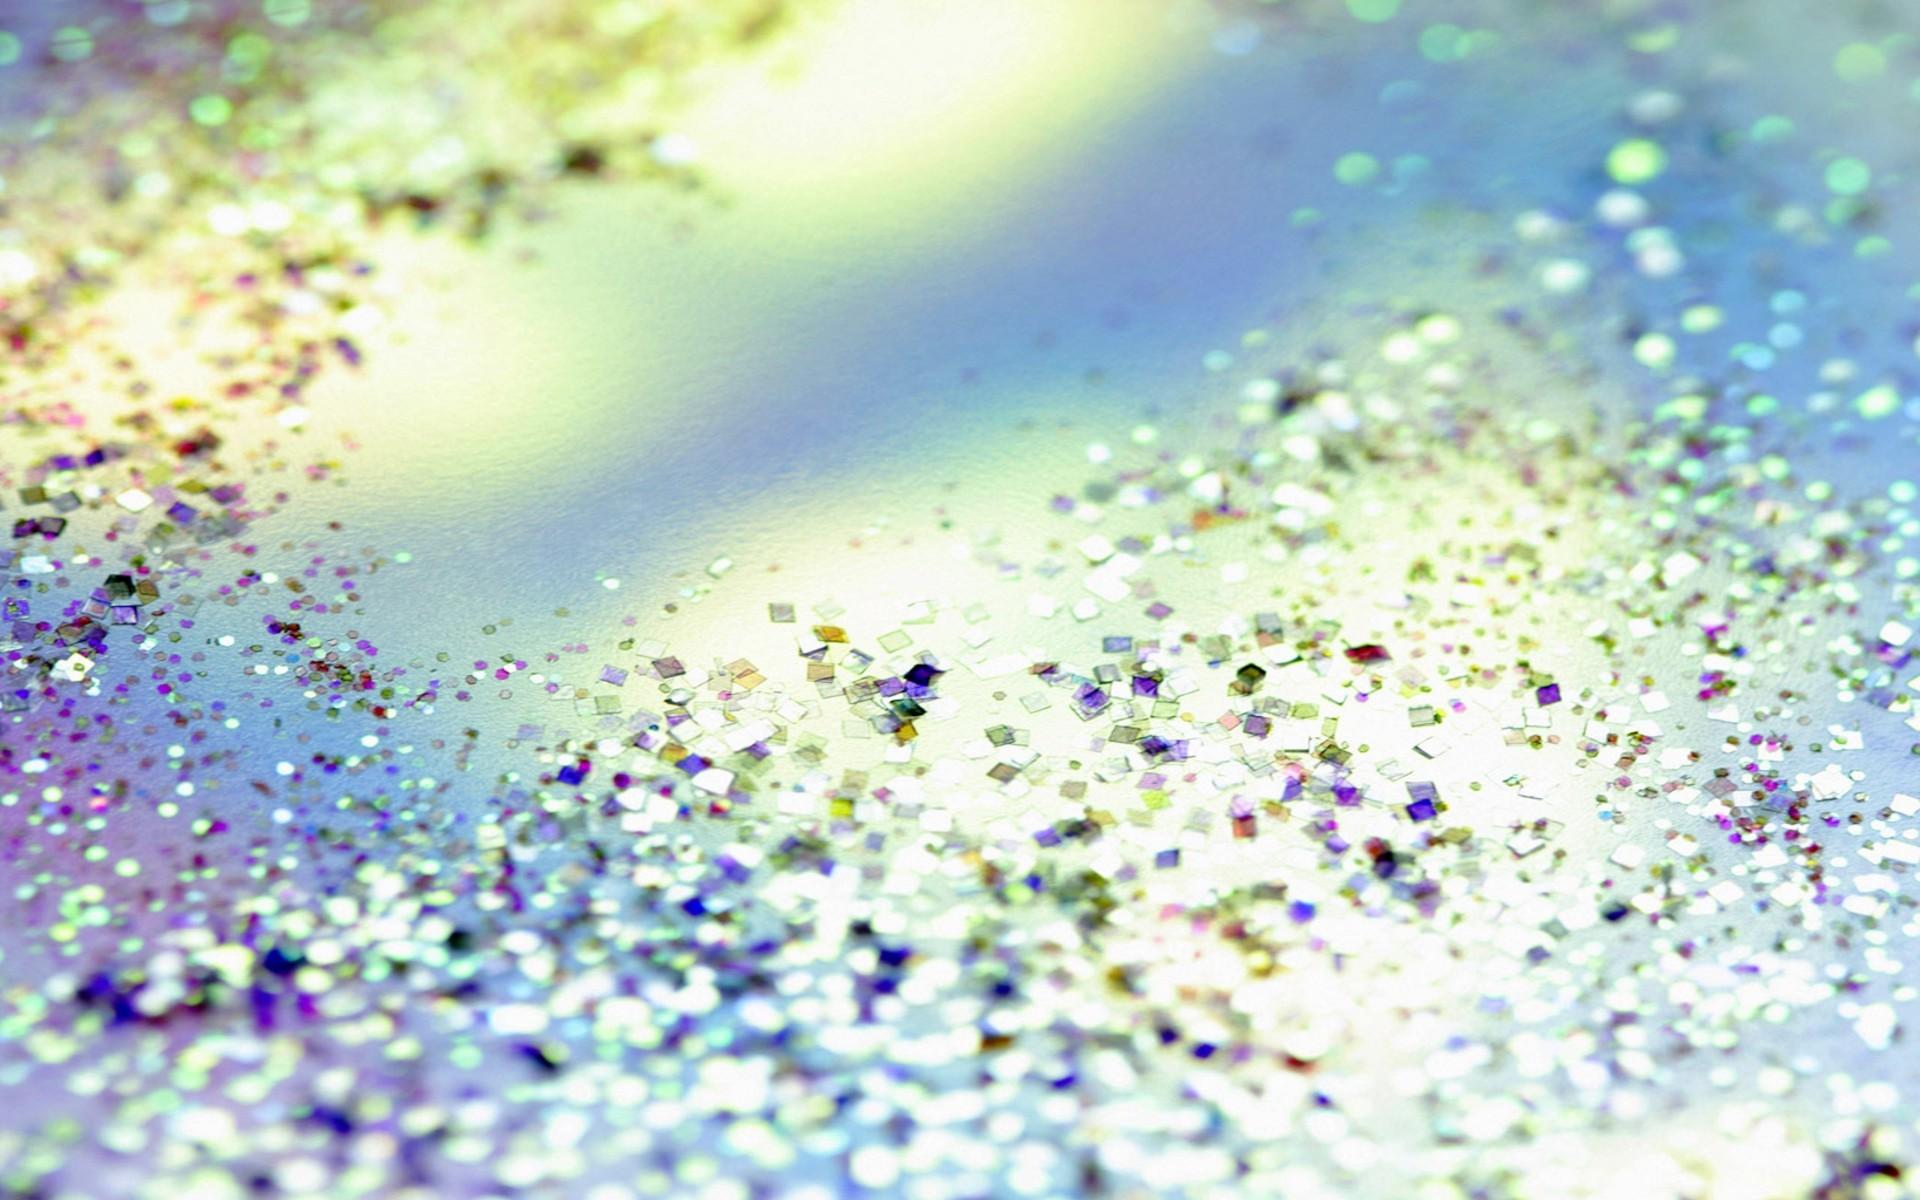 Glitter Desktop Wallpaper Backgrounds (60+ images)